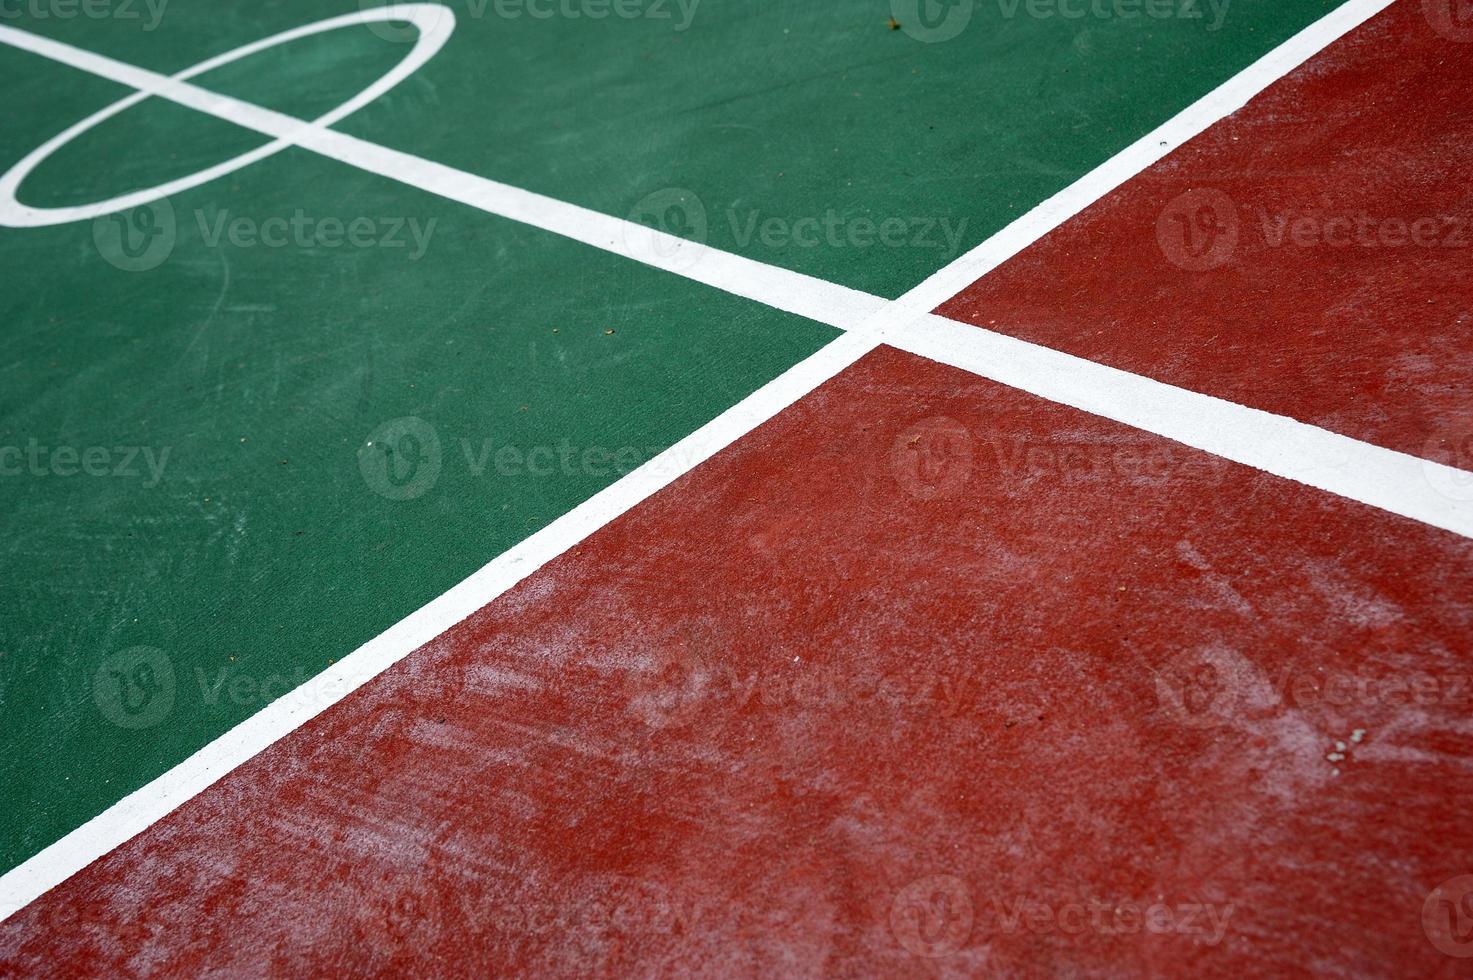 badminton veld foto